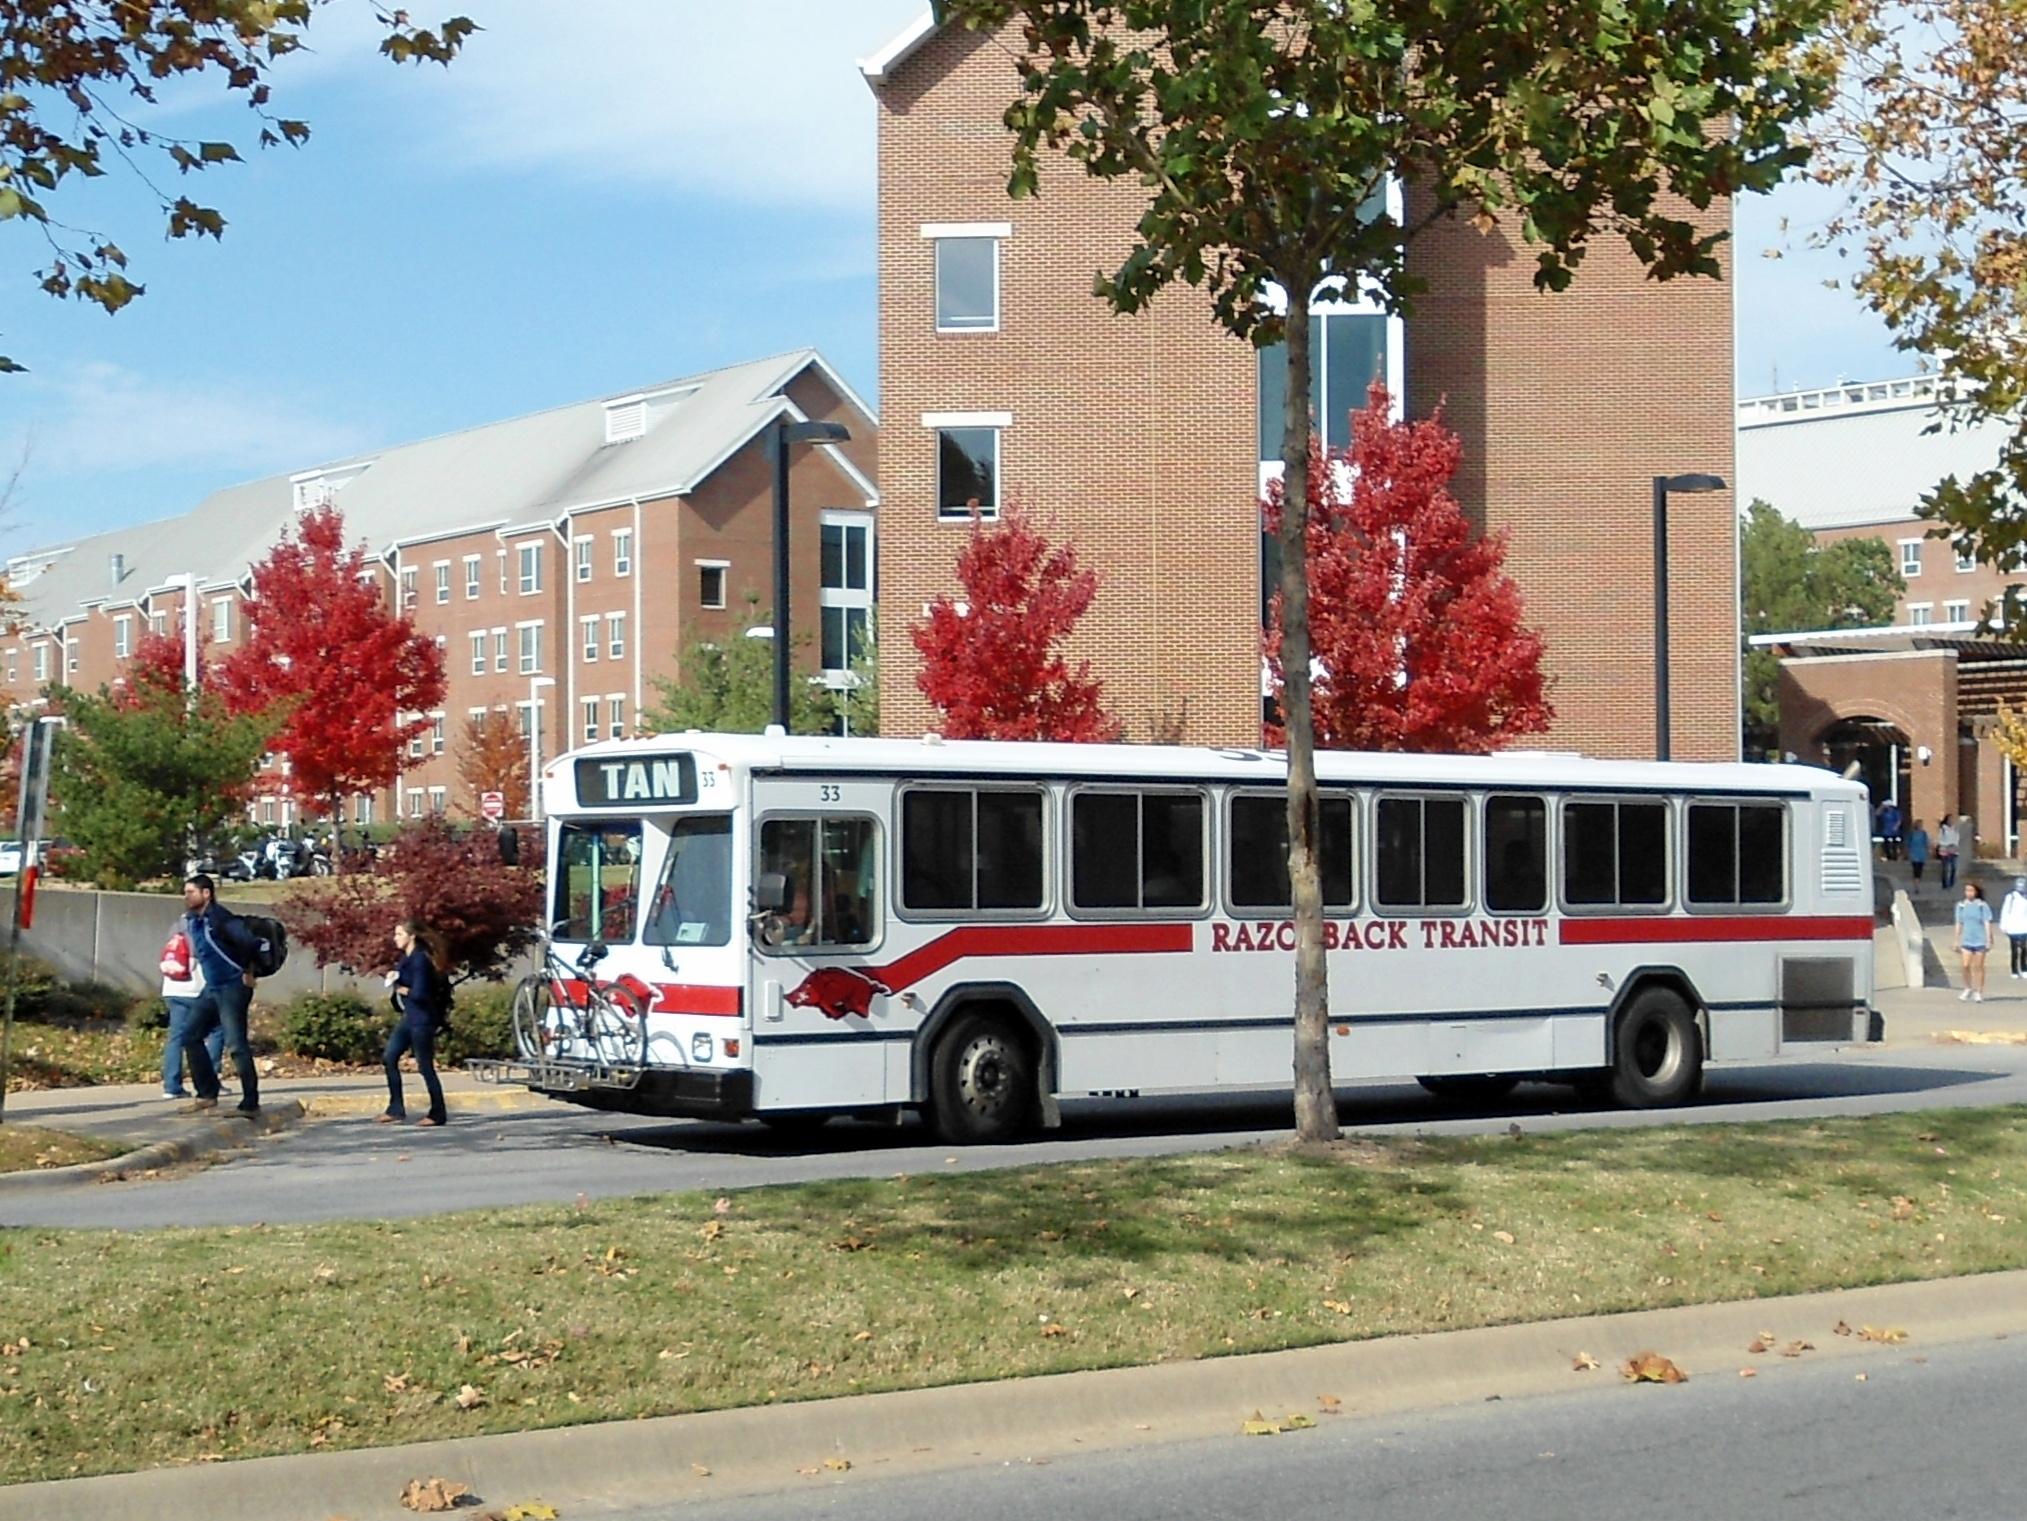 file:tan route, razorback transit makes stop at nwq - wikimedia